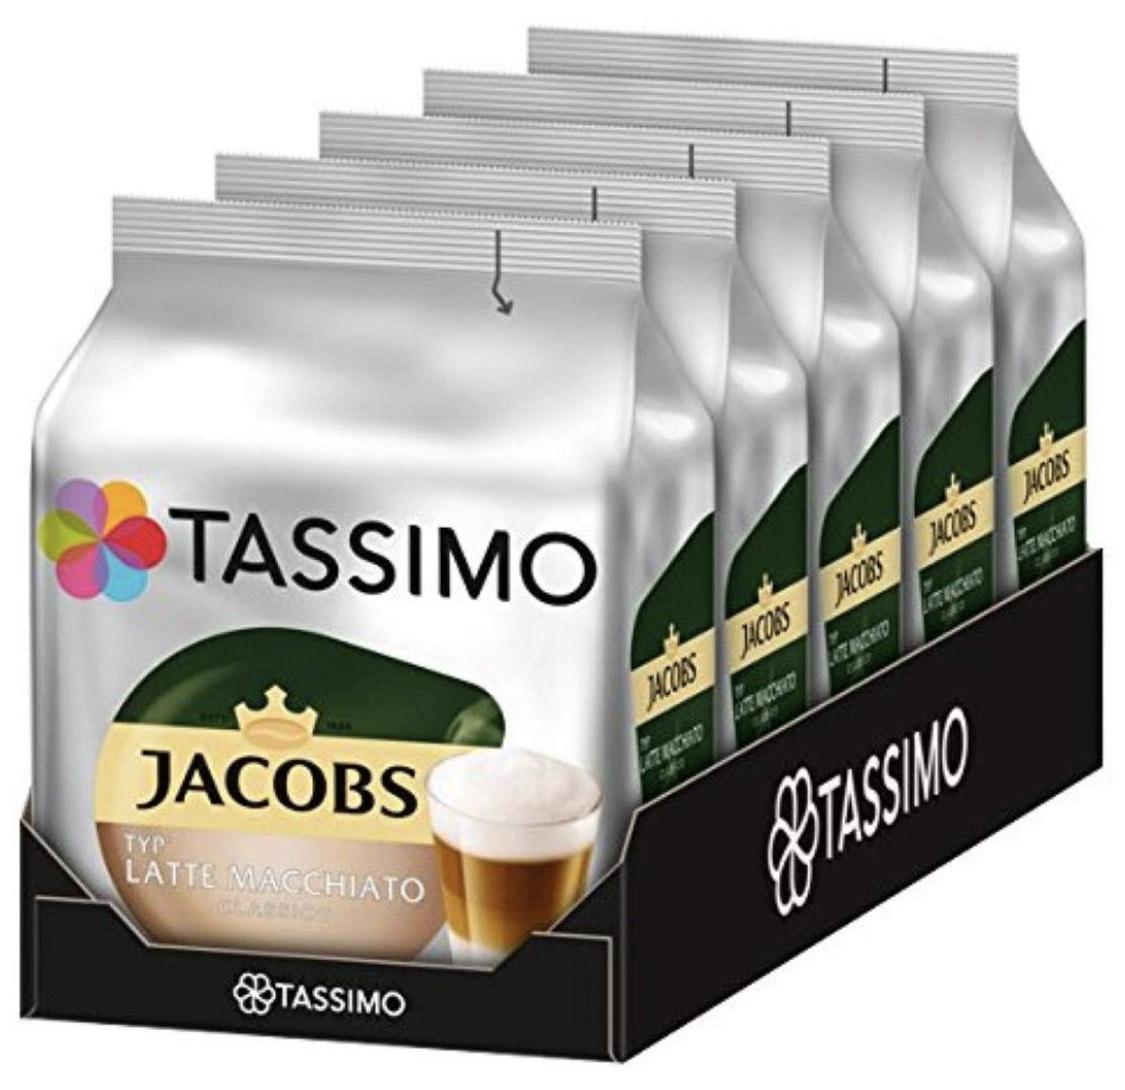 Tassimo Kapseln Jacobs Typ Latte Macchiato Classico, 40 Kaffeekapseln, 5er Pack, 5 x 8 Getränke